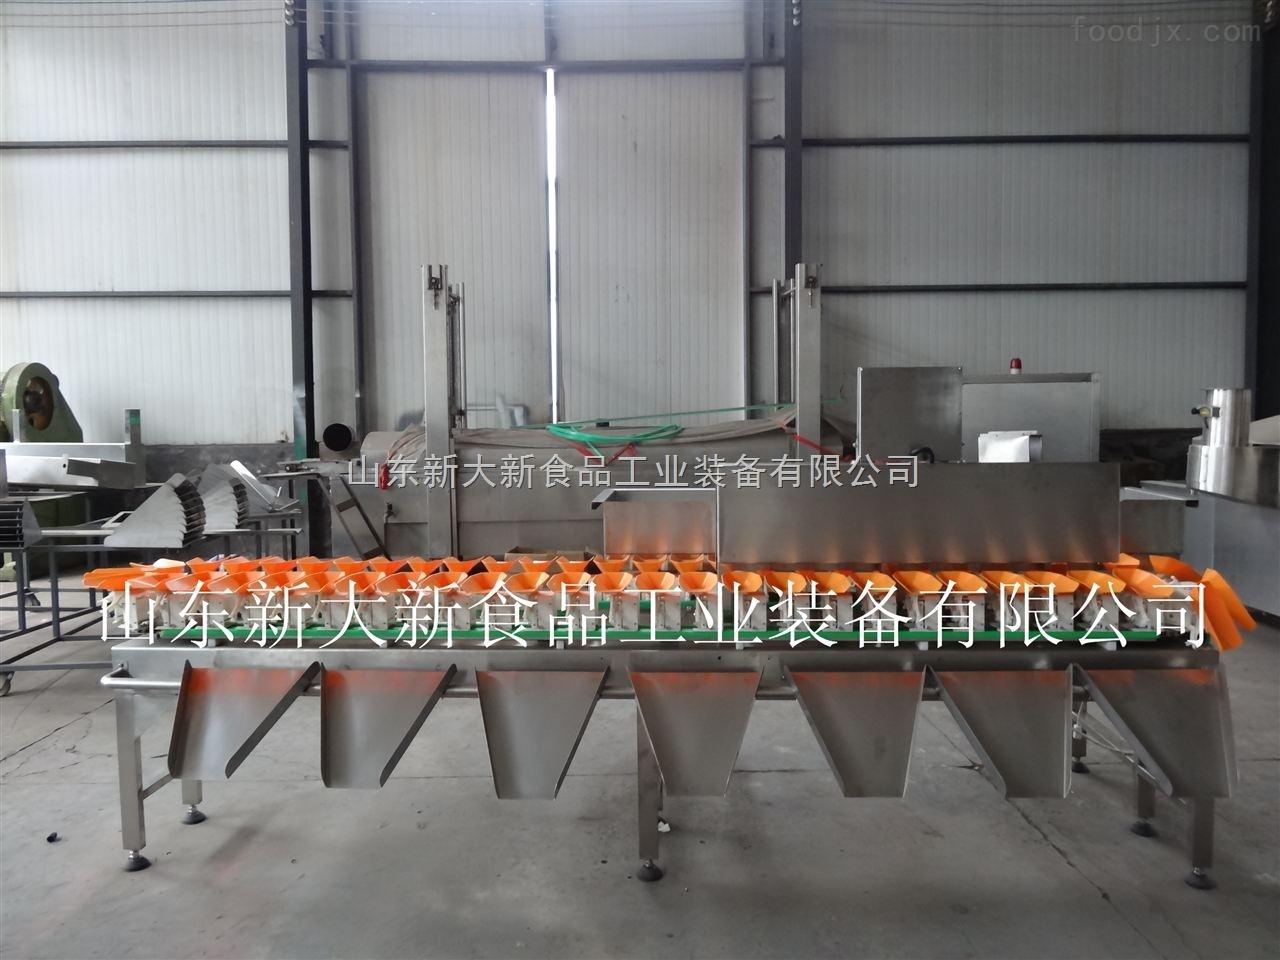 XCW-500廠家直銷雞鴨高精度重量分選機